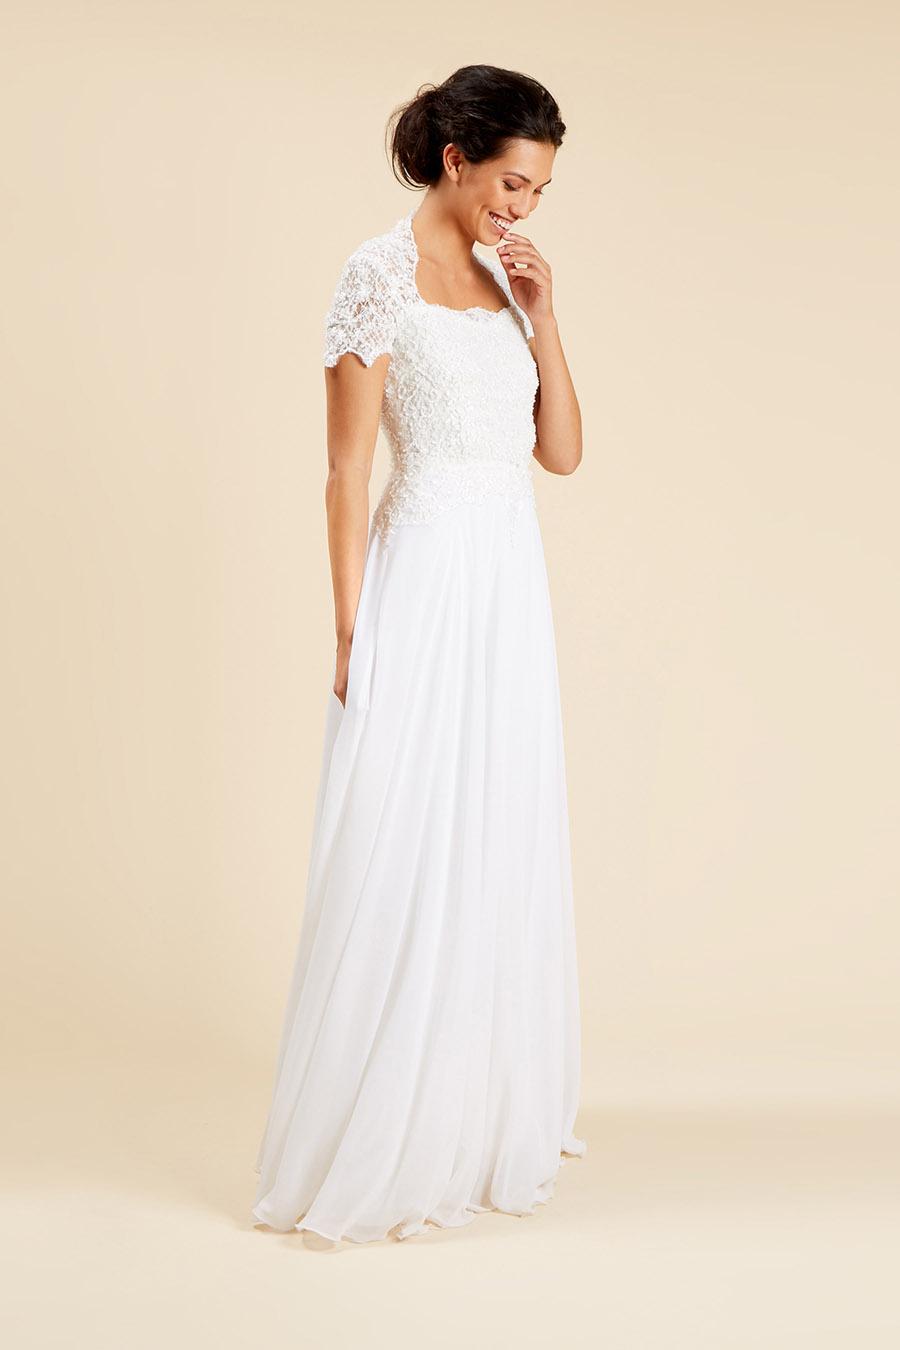 preloved wedding dresses charity wedding dress Brides Do Good UK (7)